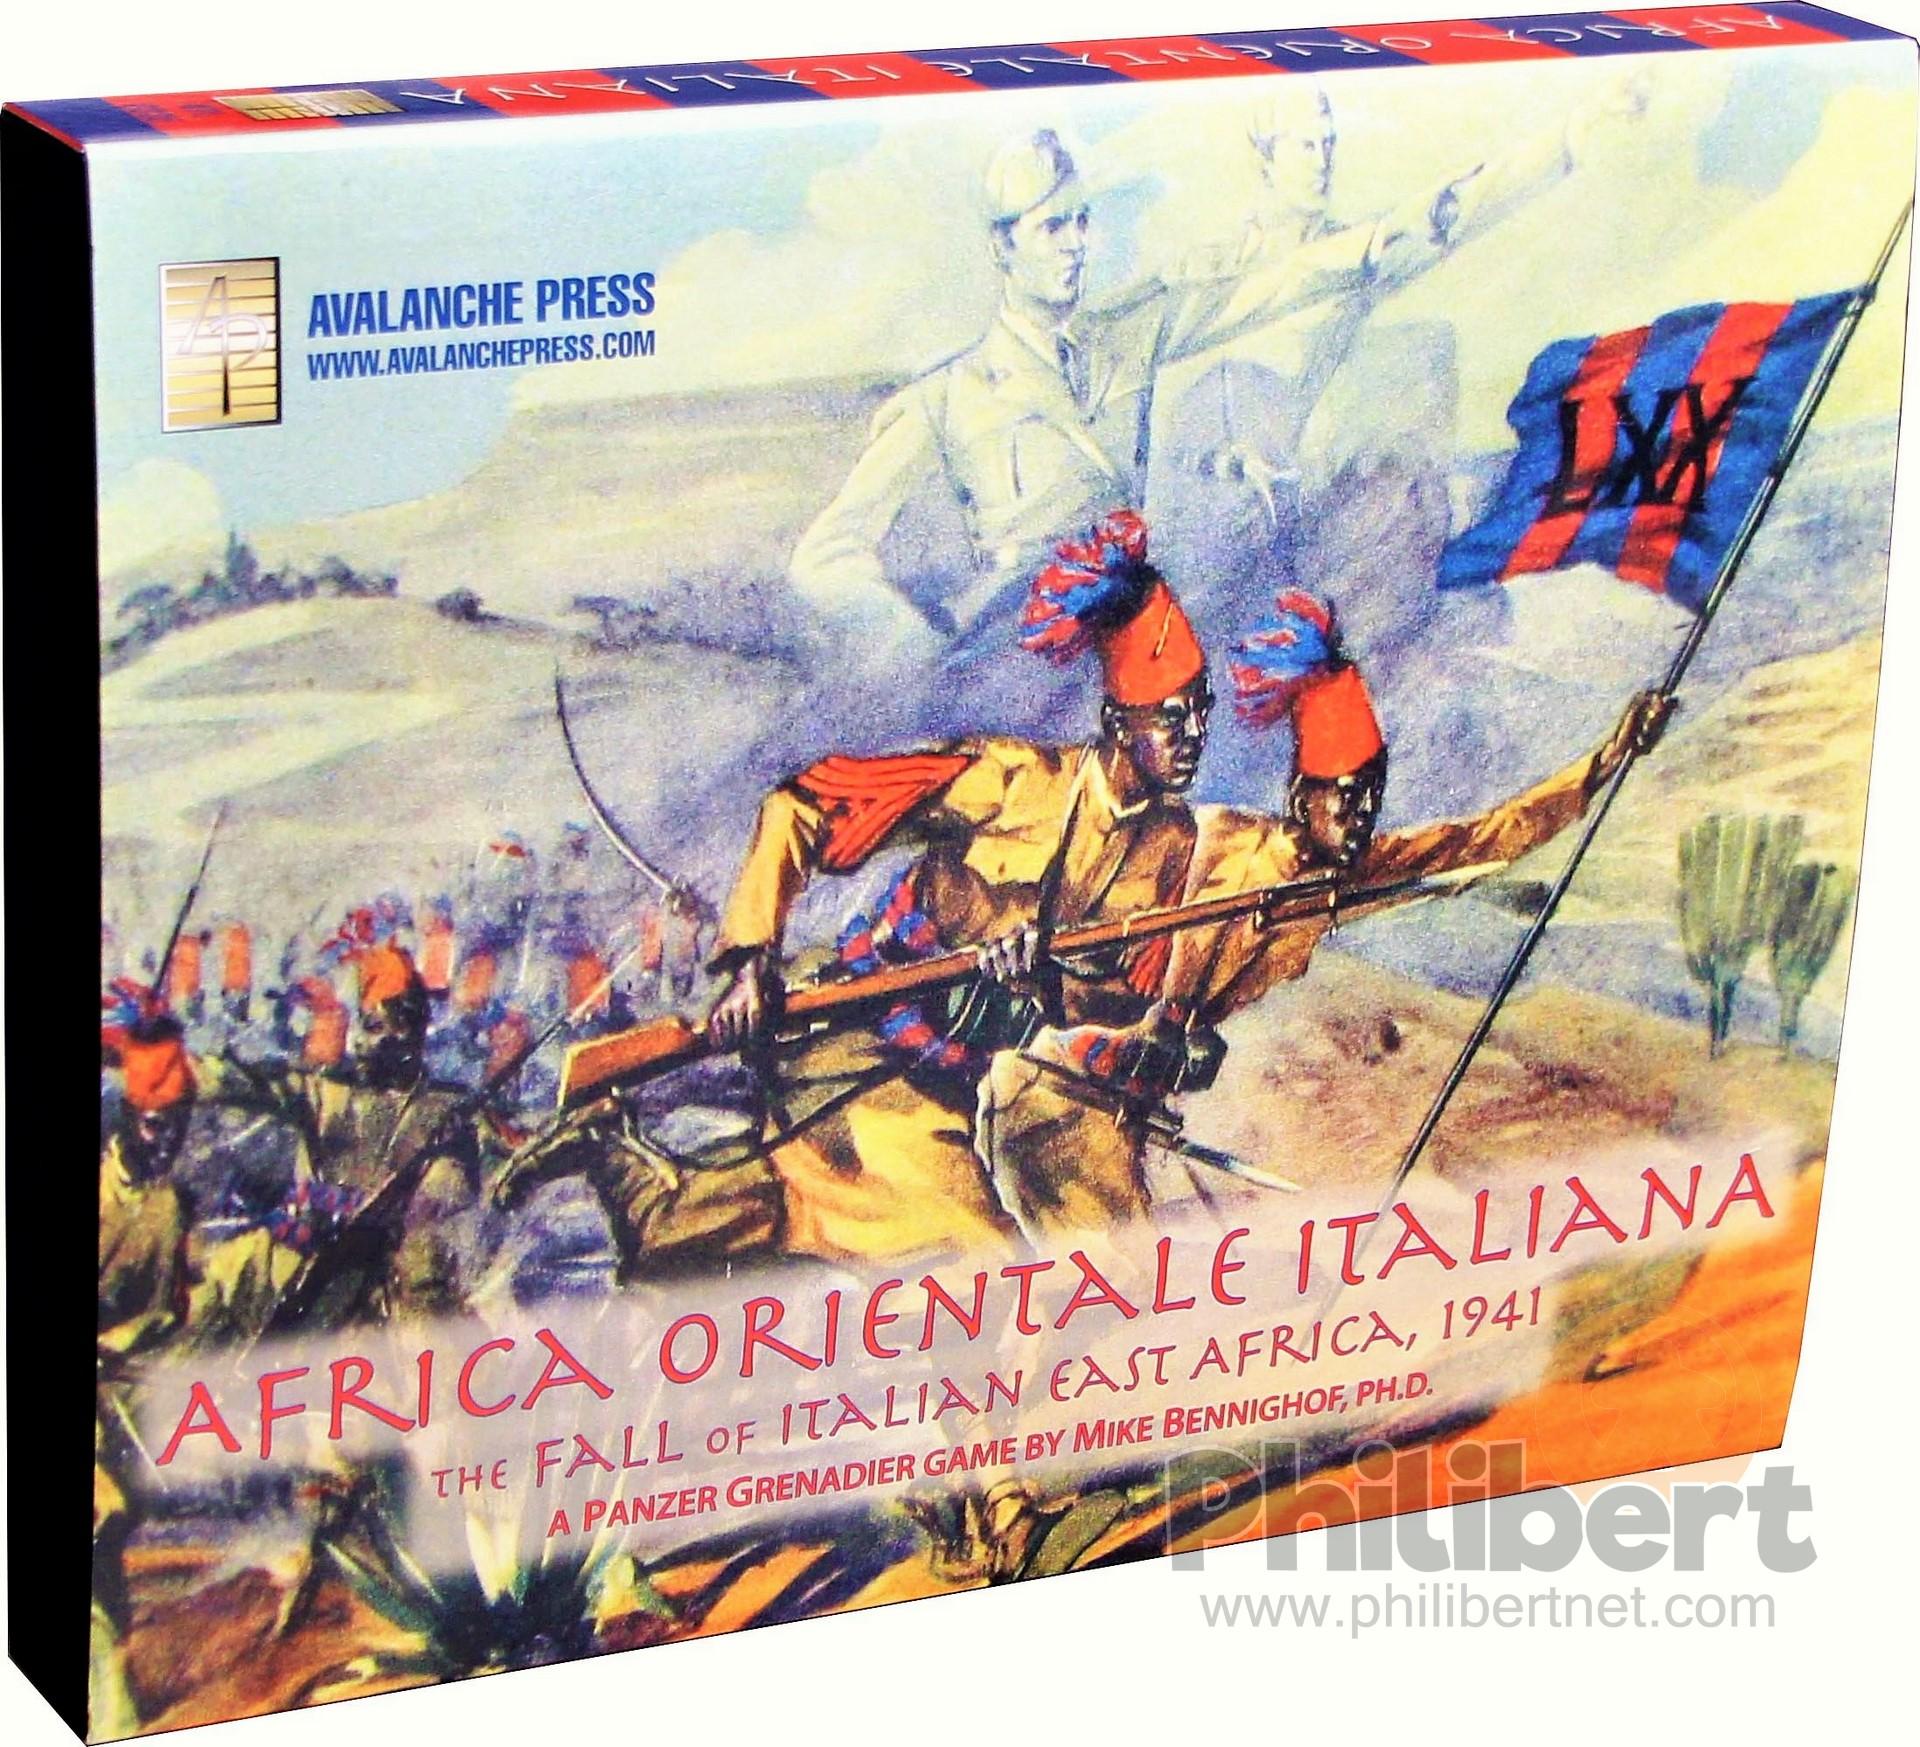 Panzer Grenadier - Africa Orientale Italiana